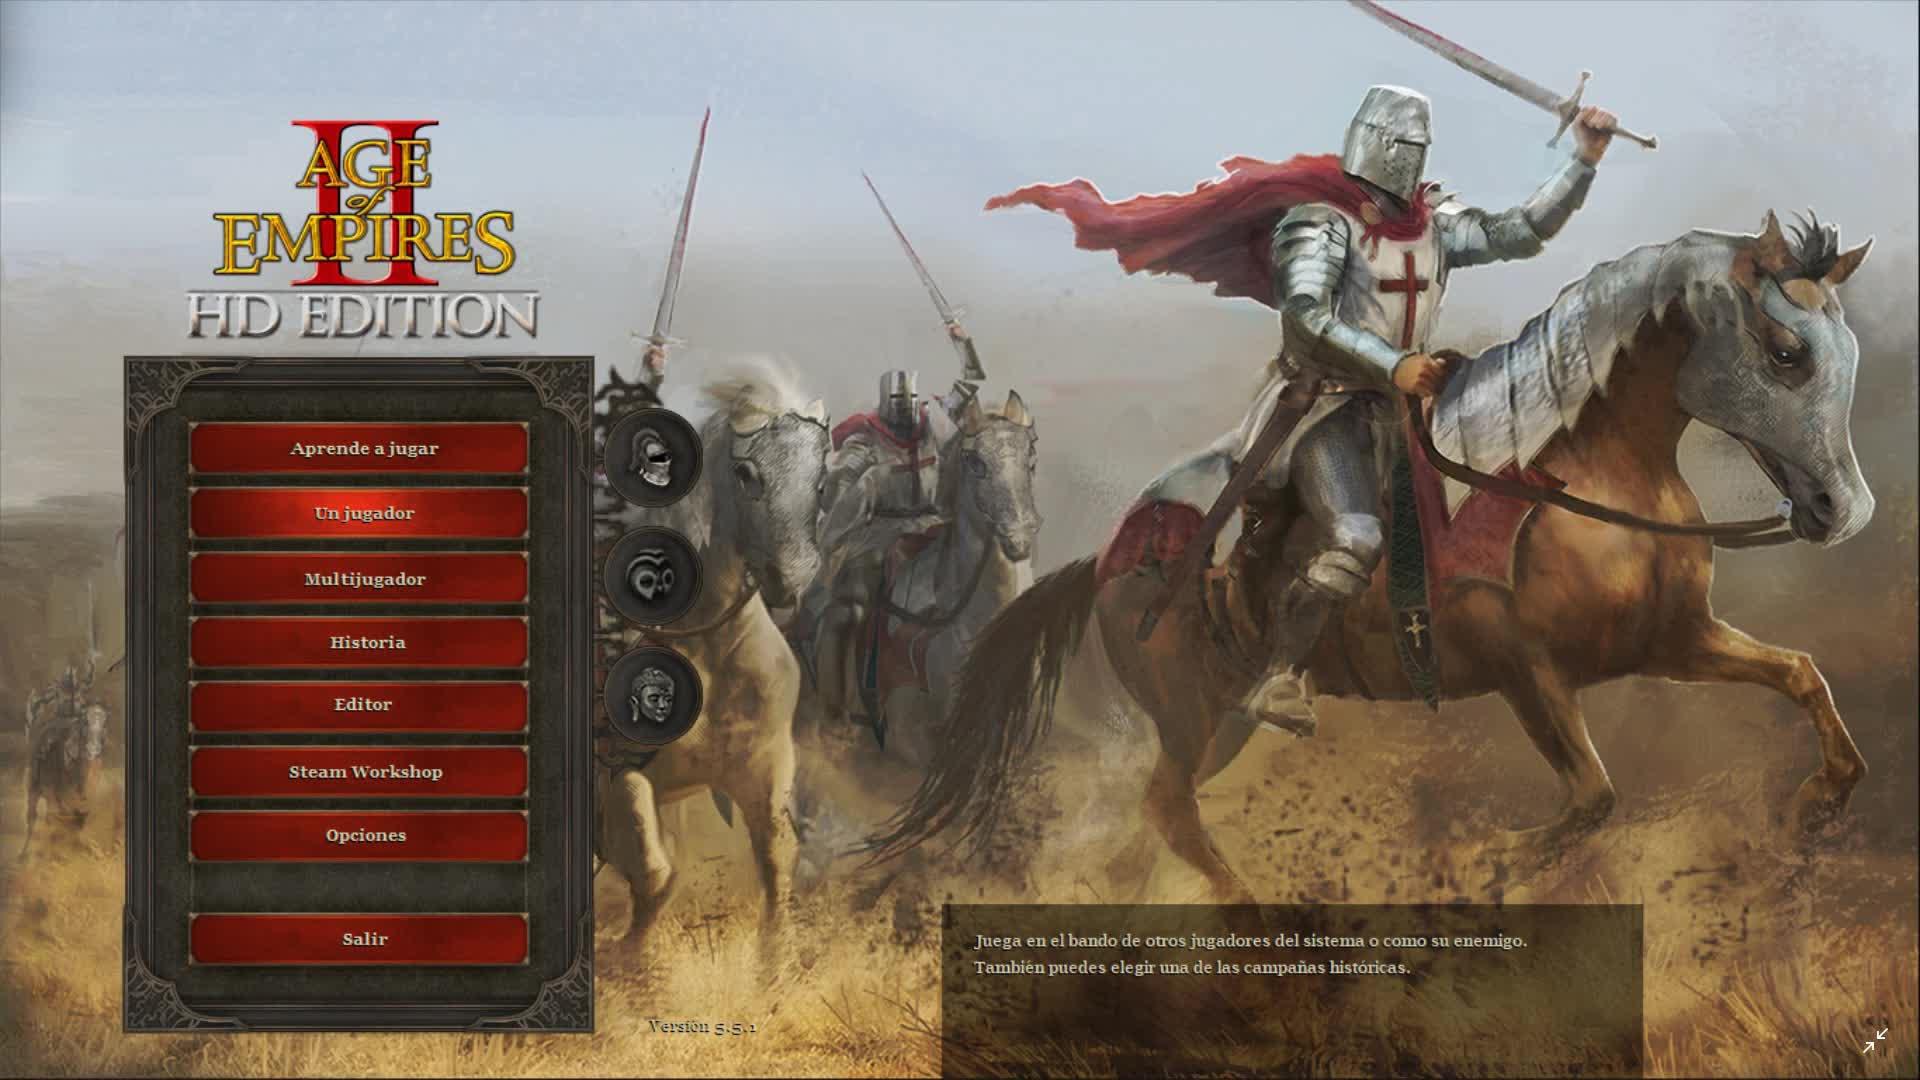 age of empires 2, aoe, enhanced interface, AOE2 HD Enhanced Interface GIFs